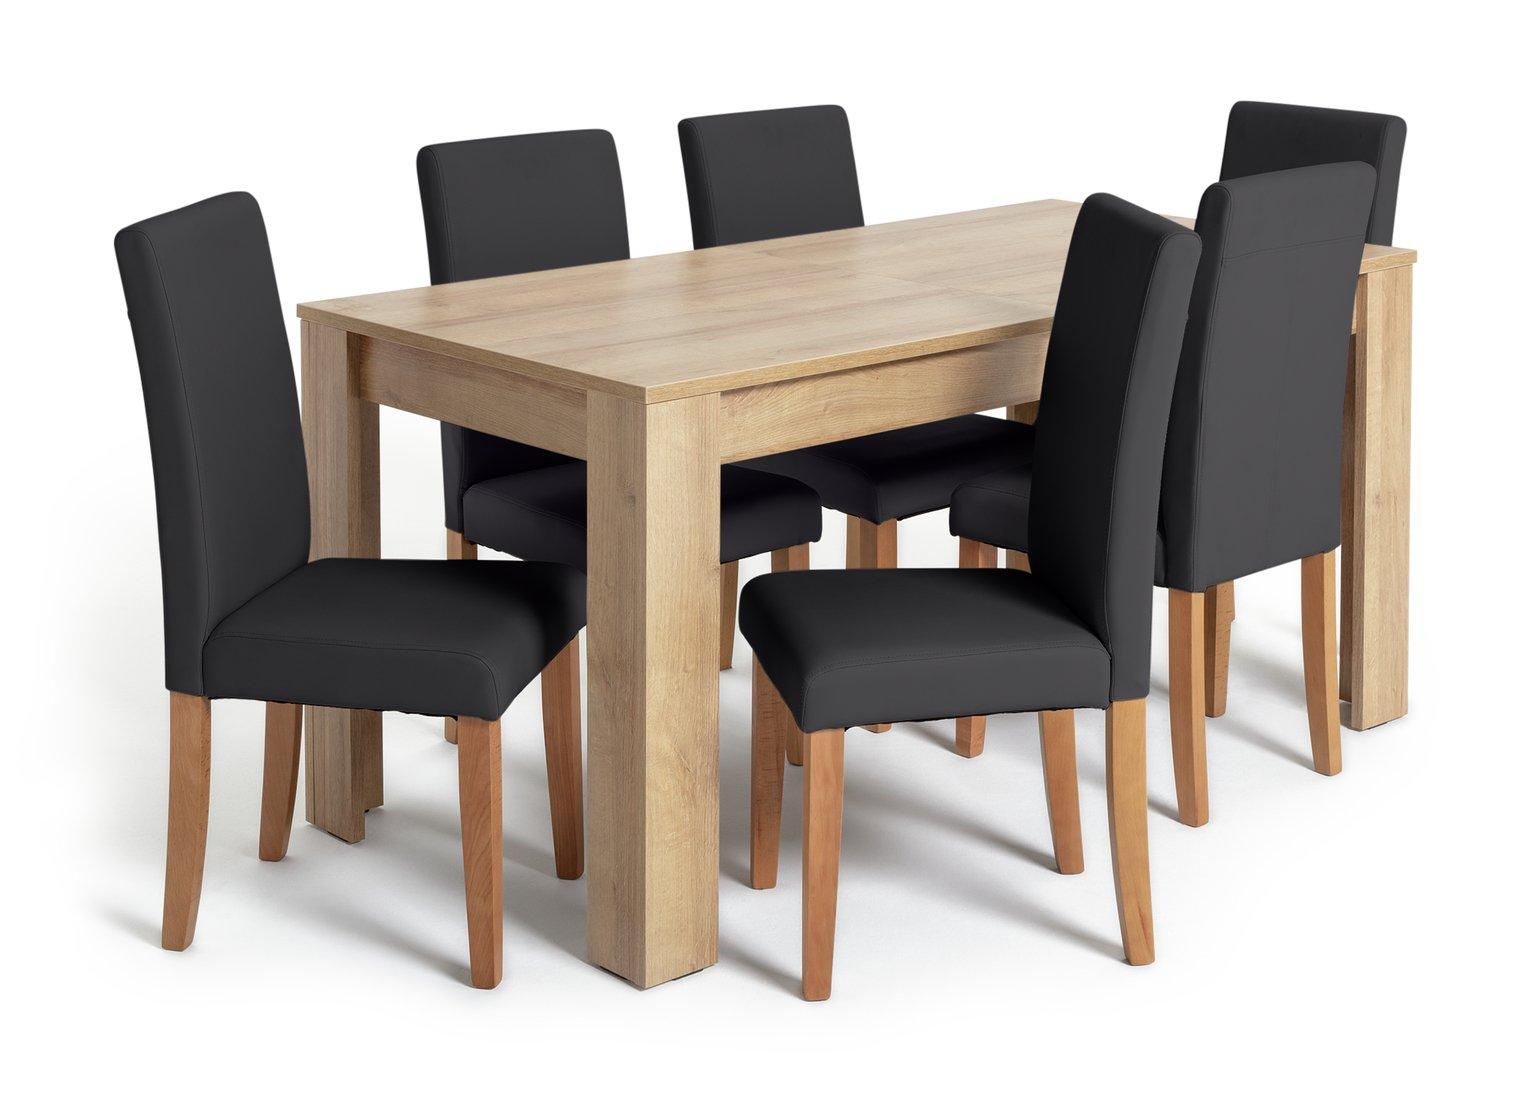 Argos Home Miami XL Extending Table & 6 Black Chairs